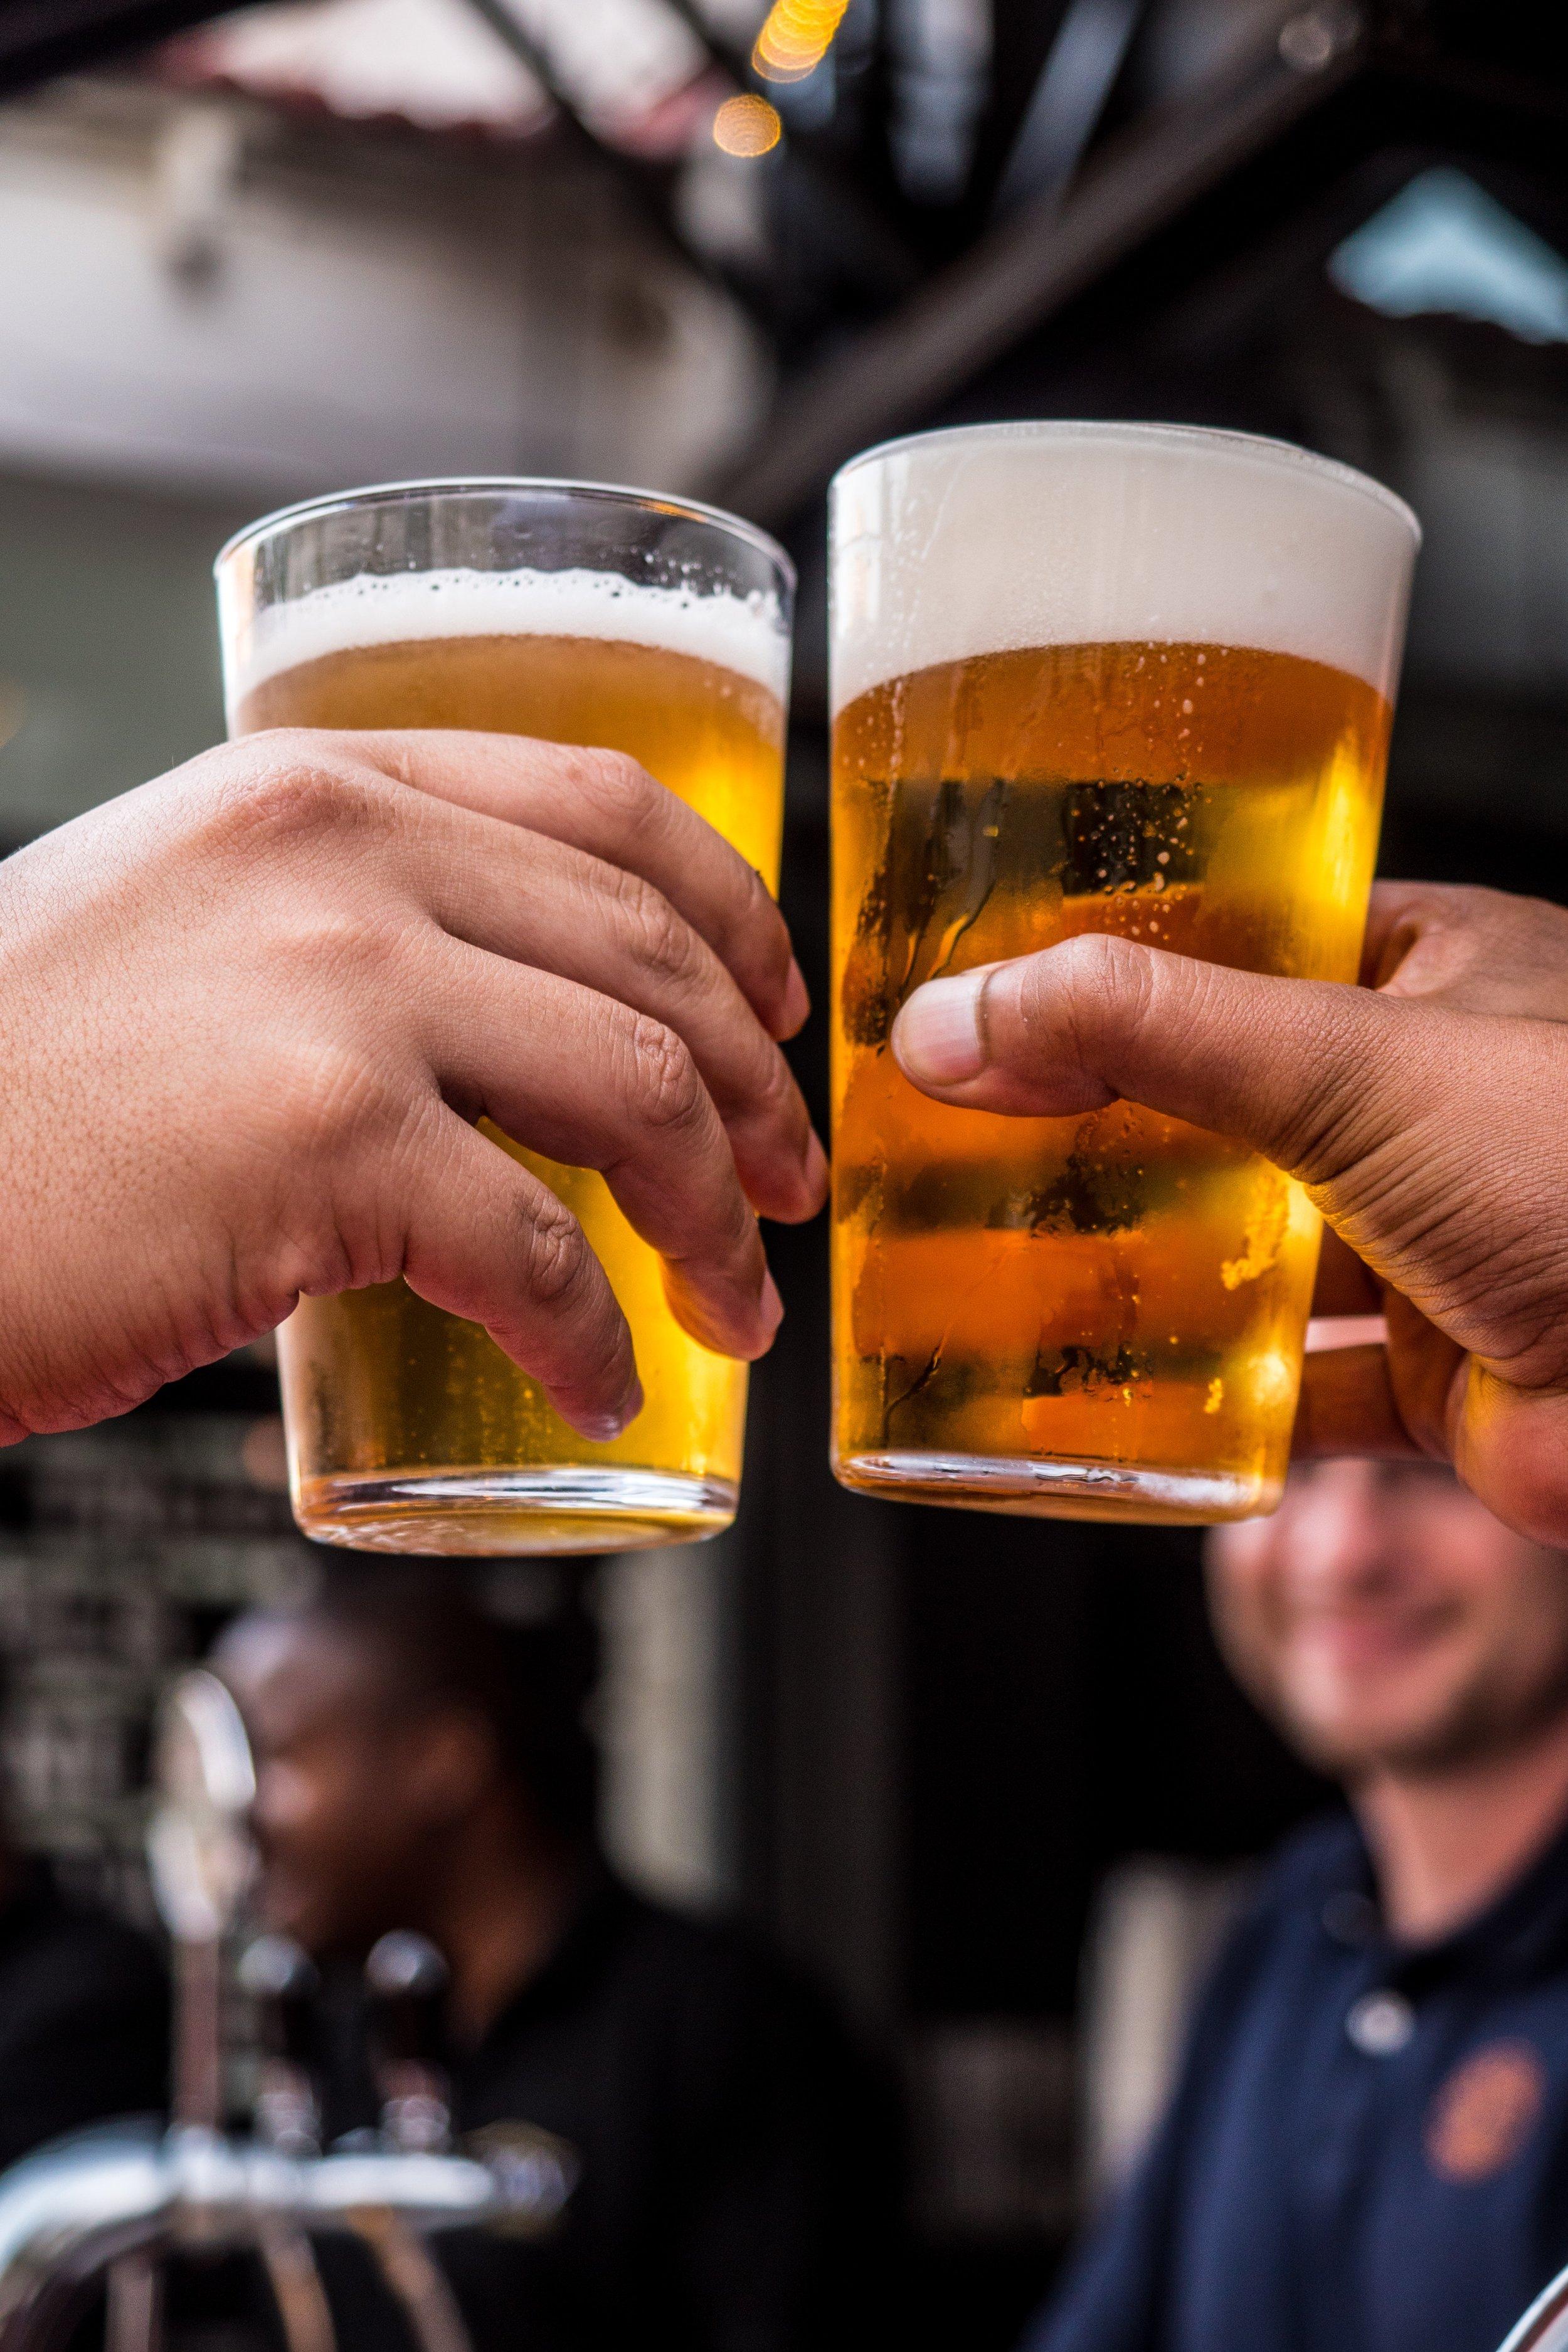 alcohol-alcoholic-beverage-bar-1089930.jpg